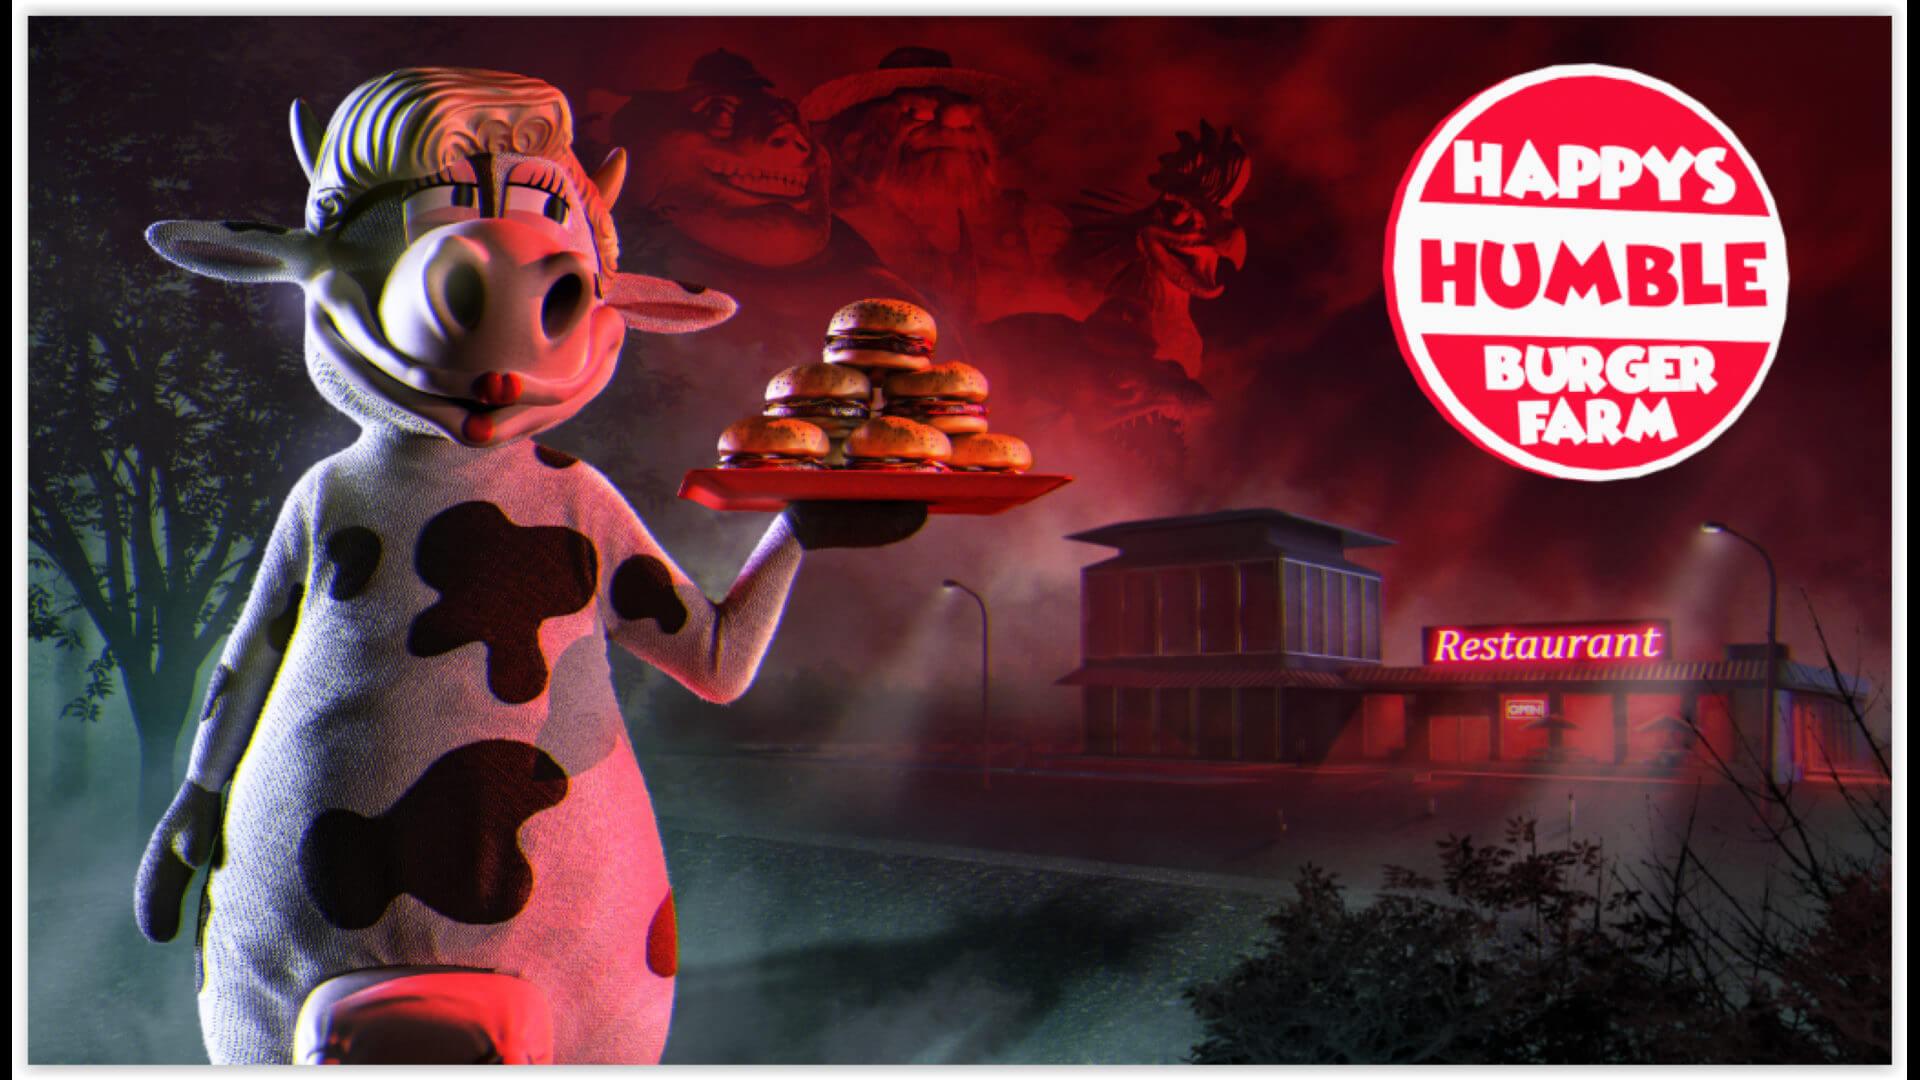 Happy's Humble Burger Farm Key Art